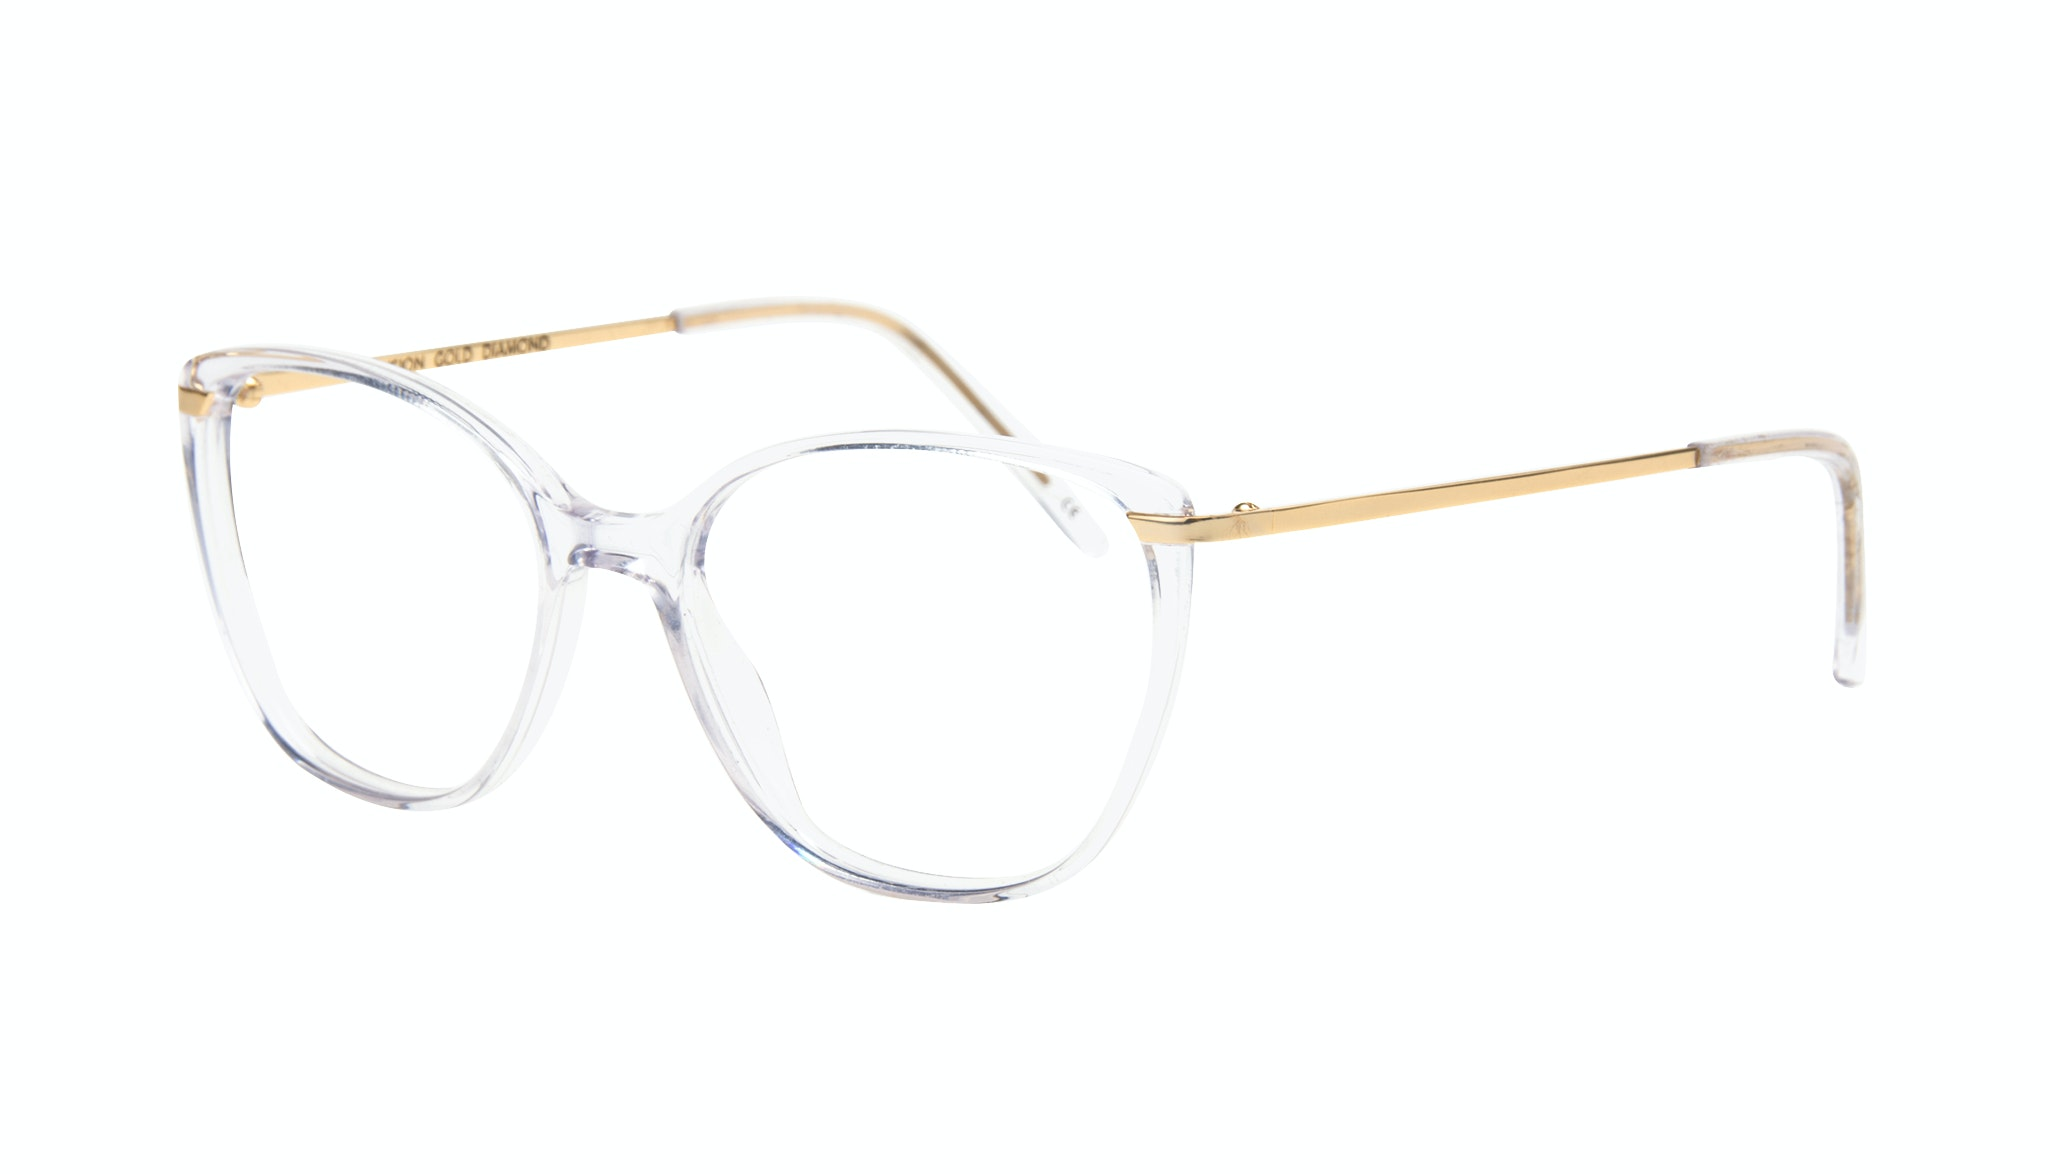 Affordable Fashion Glasses Cat Eye Rectangle Eyeglasses Women Illusion Gold Diamond Tilt